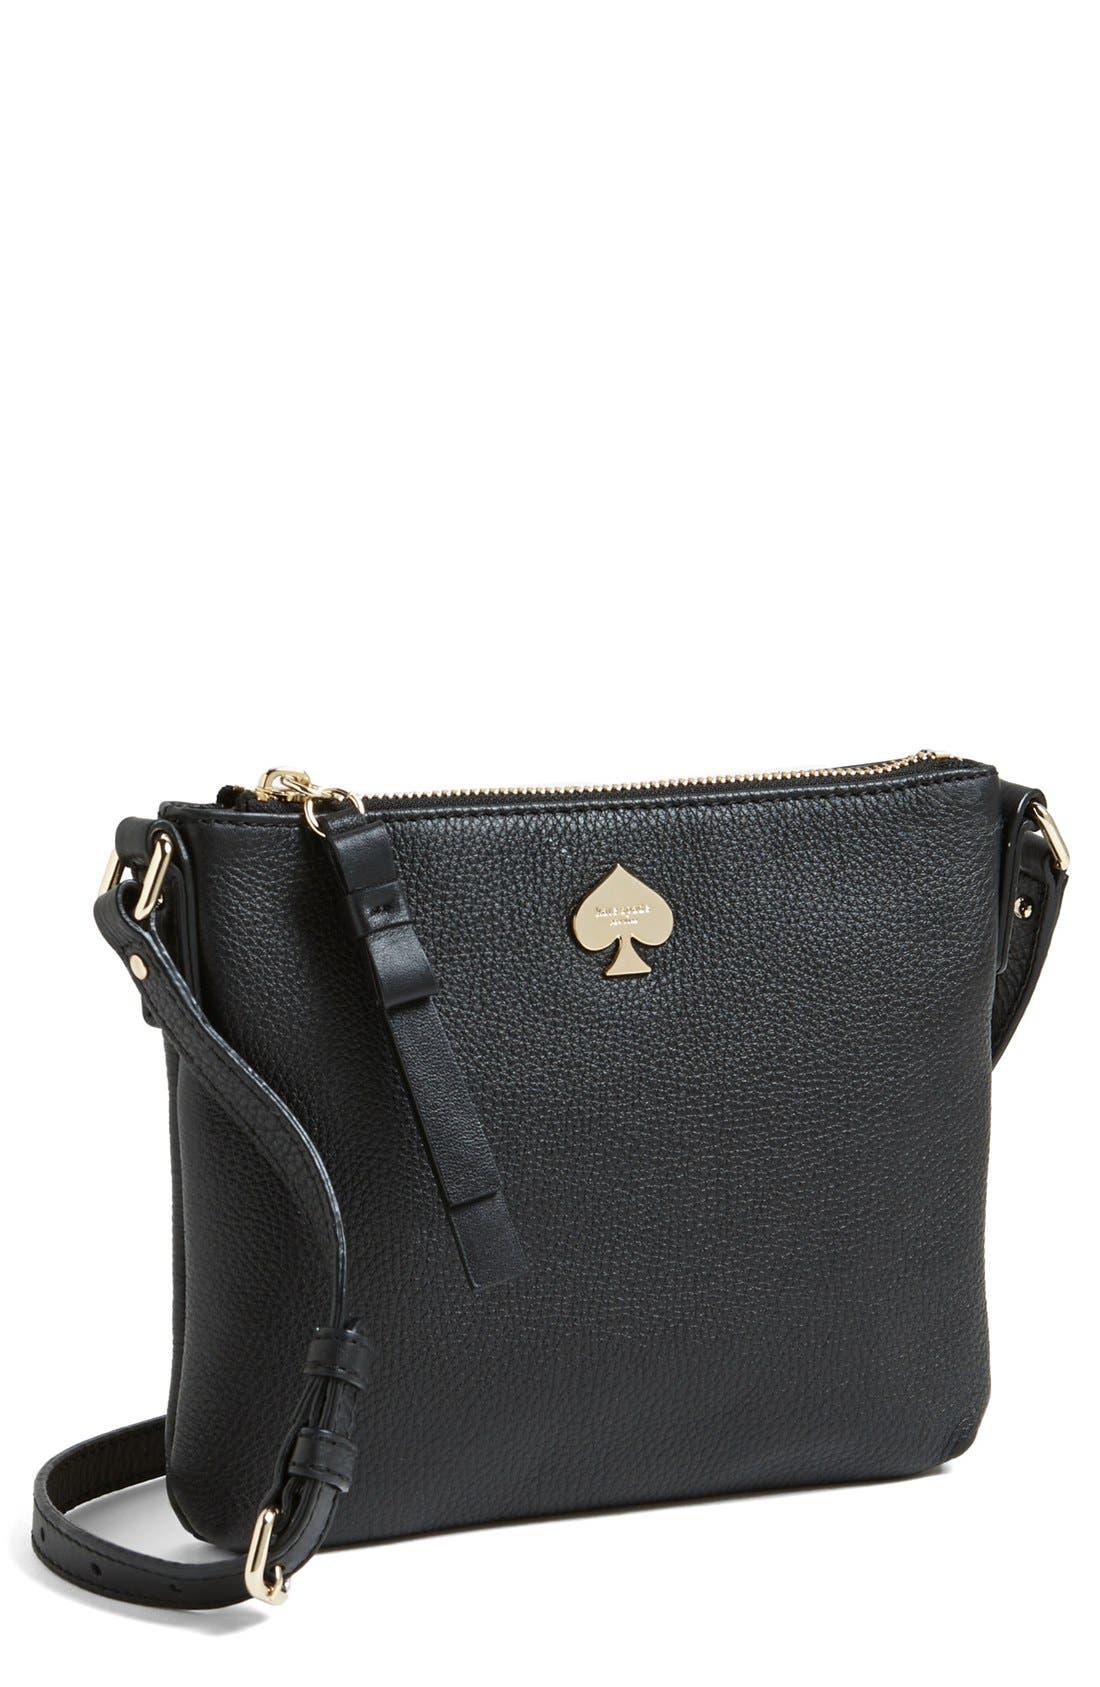 Main Image - kate spade new york 'leroy street - tenley' crossbody bag